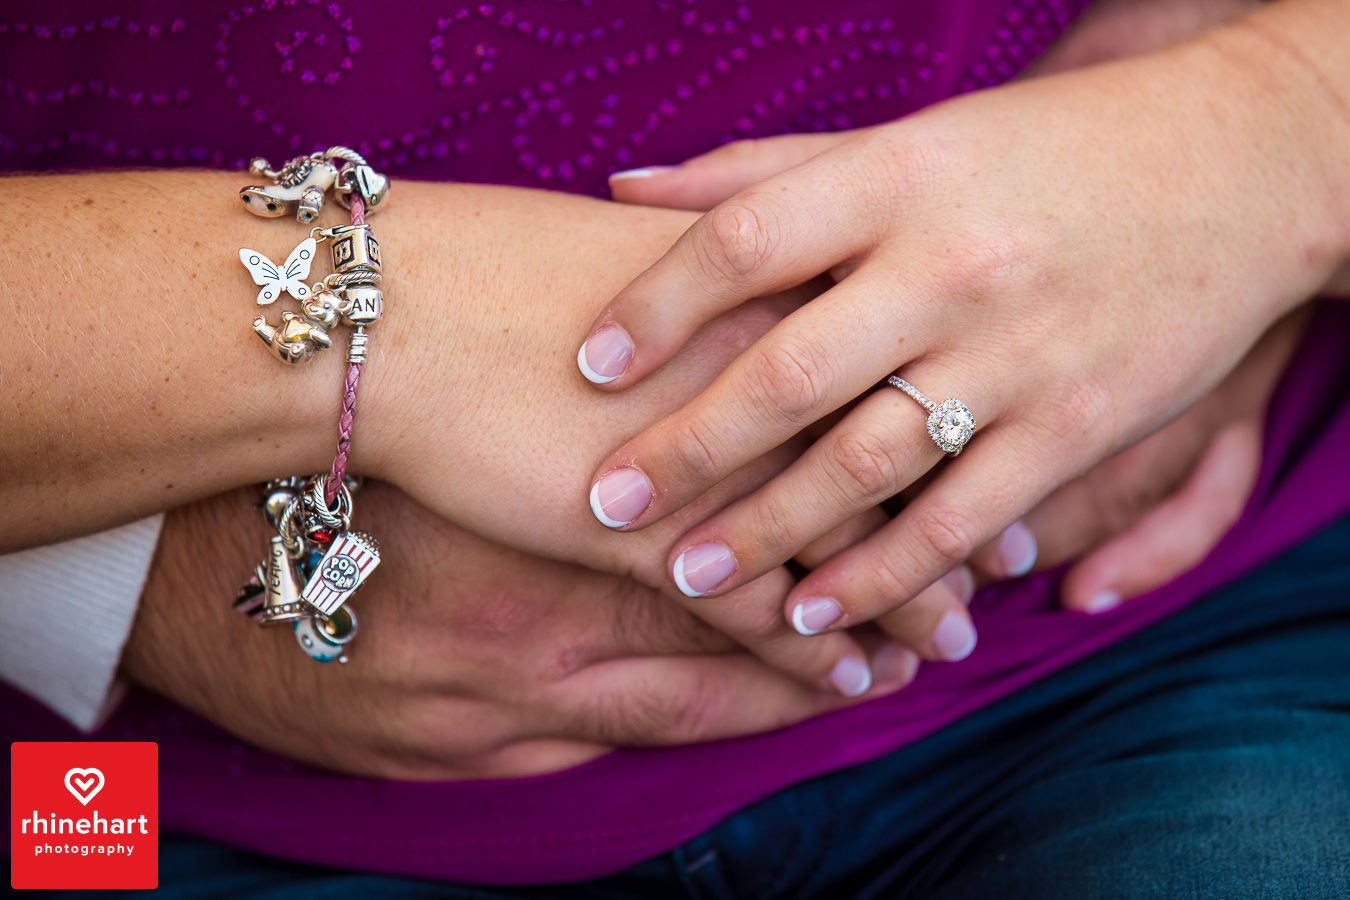 lebanon-valley-college-wedding-engagement-photographers-creative-unique-top-best-6